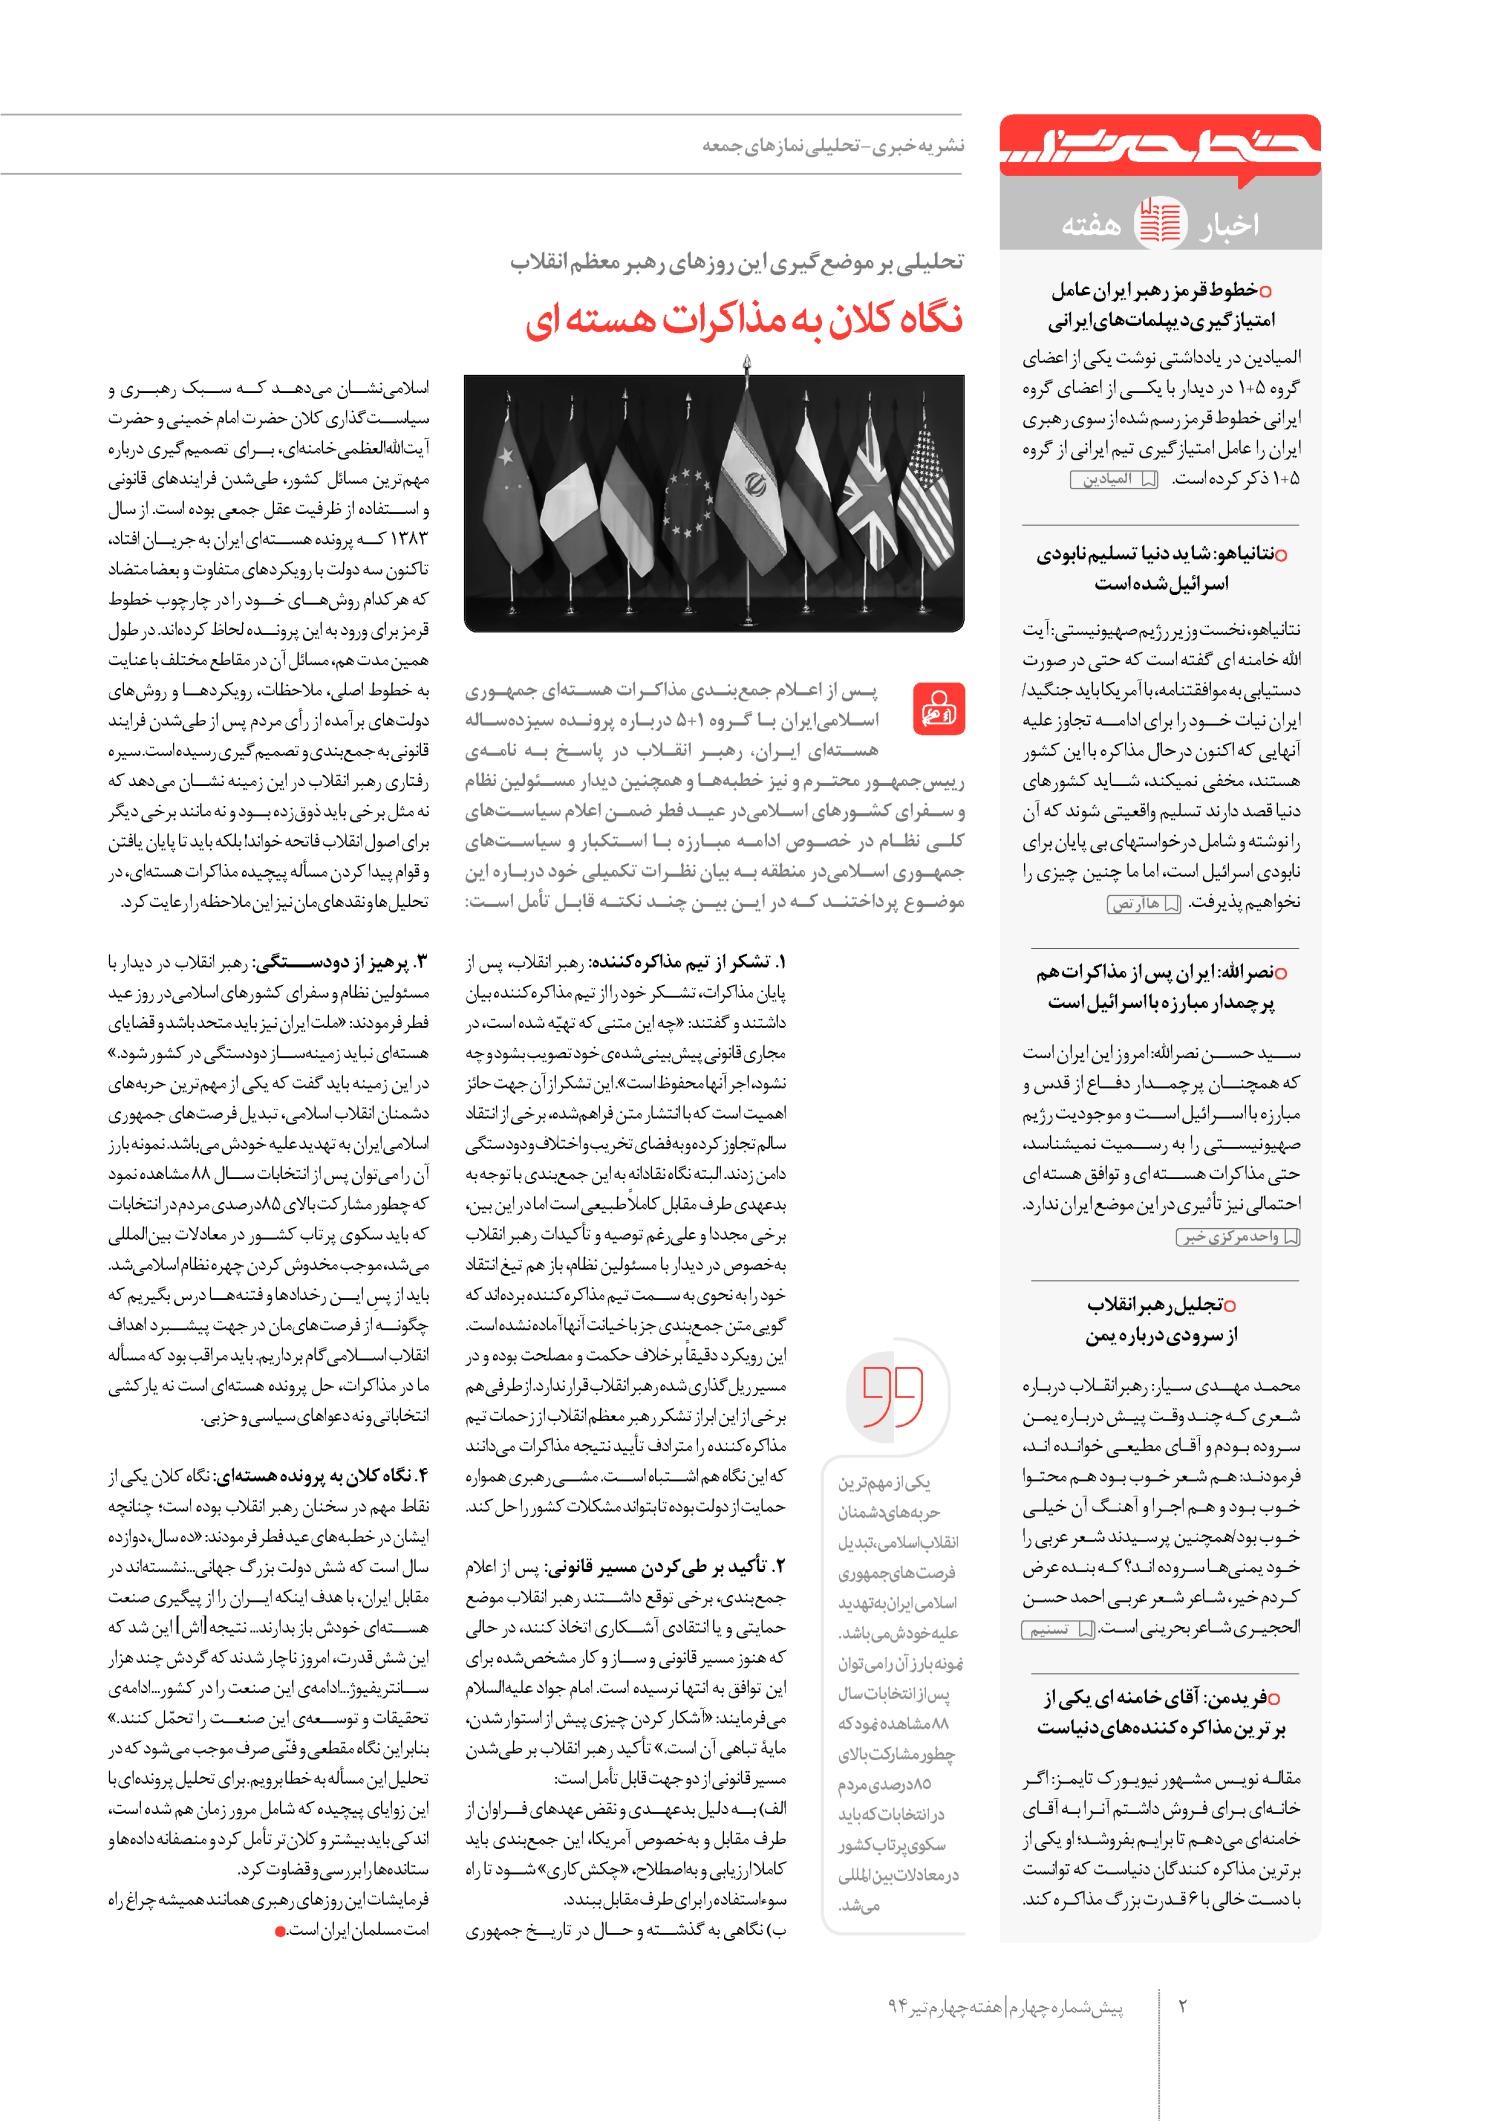 خط حزب الله -پیش شماره چهارم page large 21